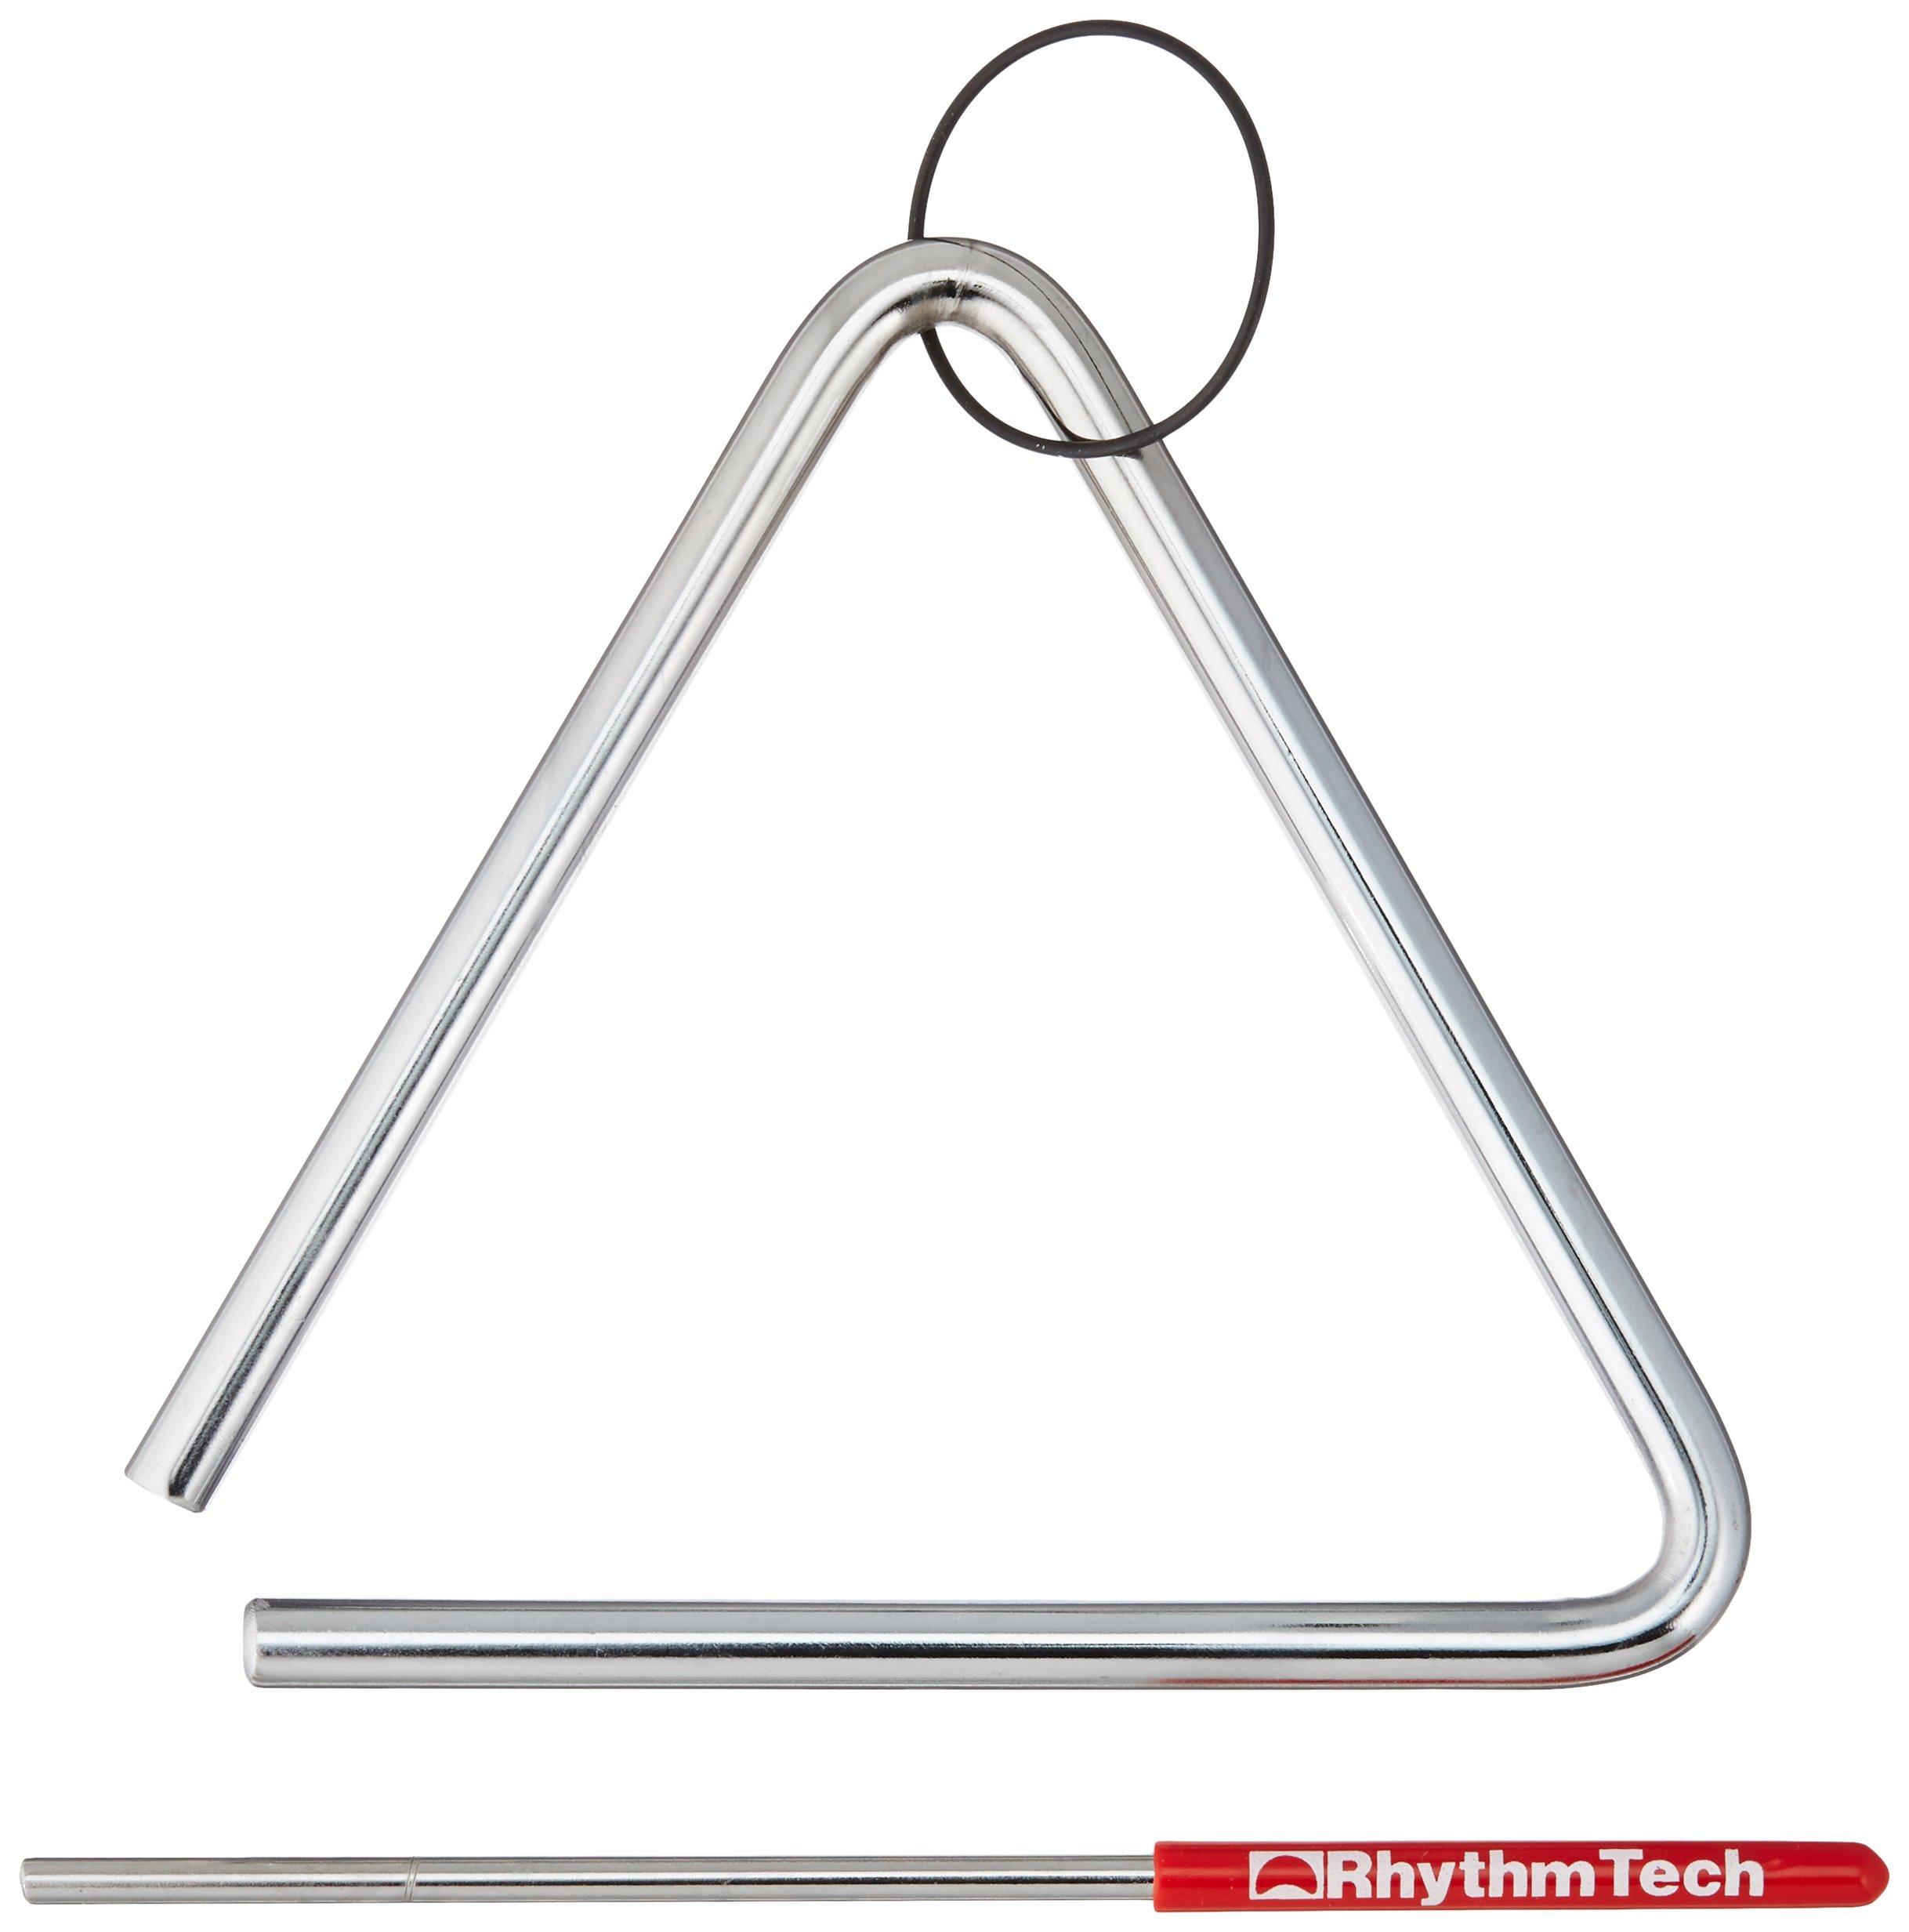 Rhythm Tech RT 6006 6 Inch Triangle with Striker